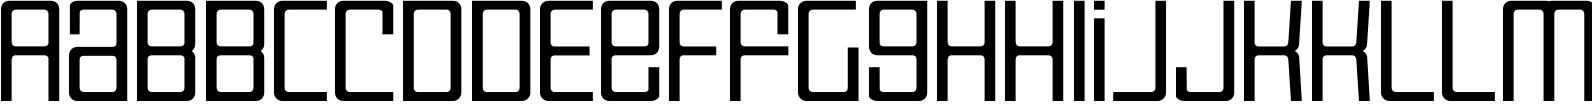 Jetlab Light